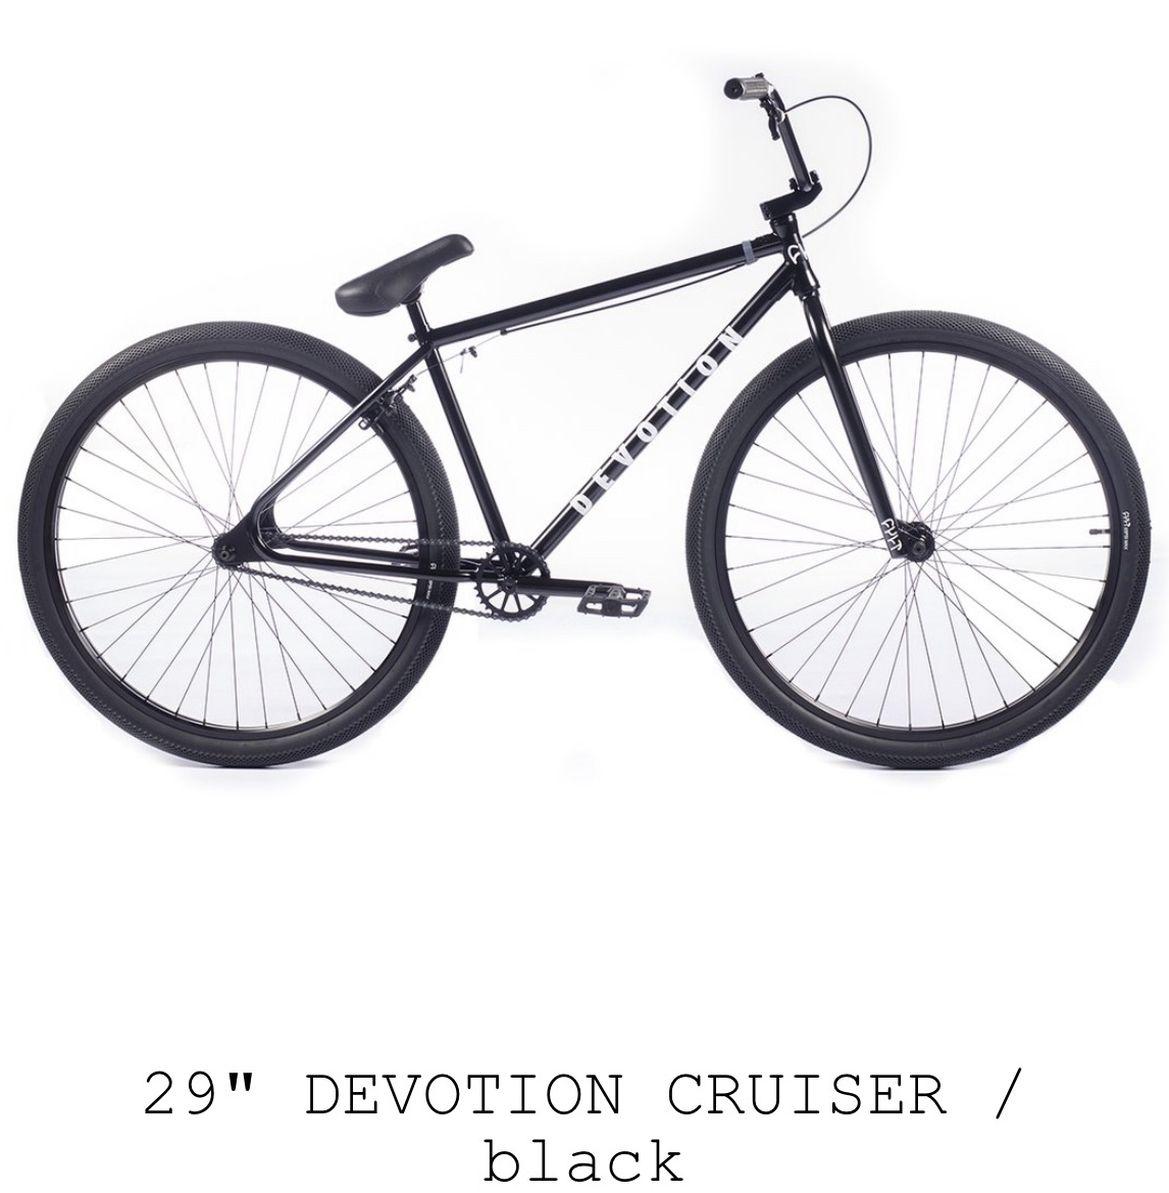 "CULT CREW - 29"" DEVOTION CRUISER  BLACK  BRAND NEW IN BOX"